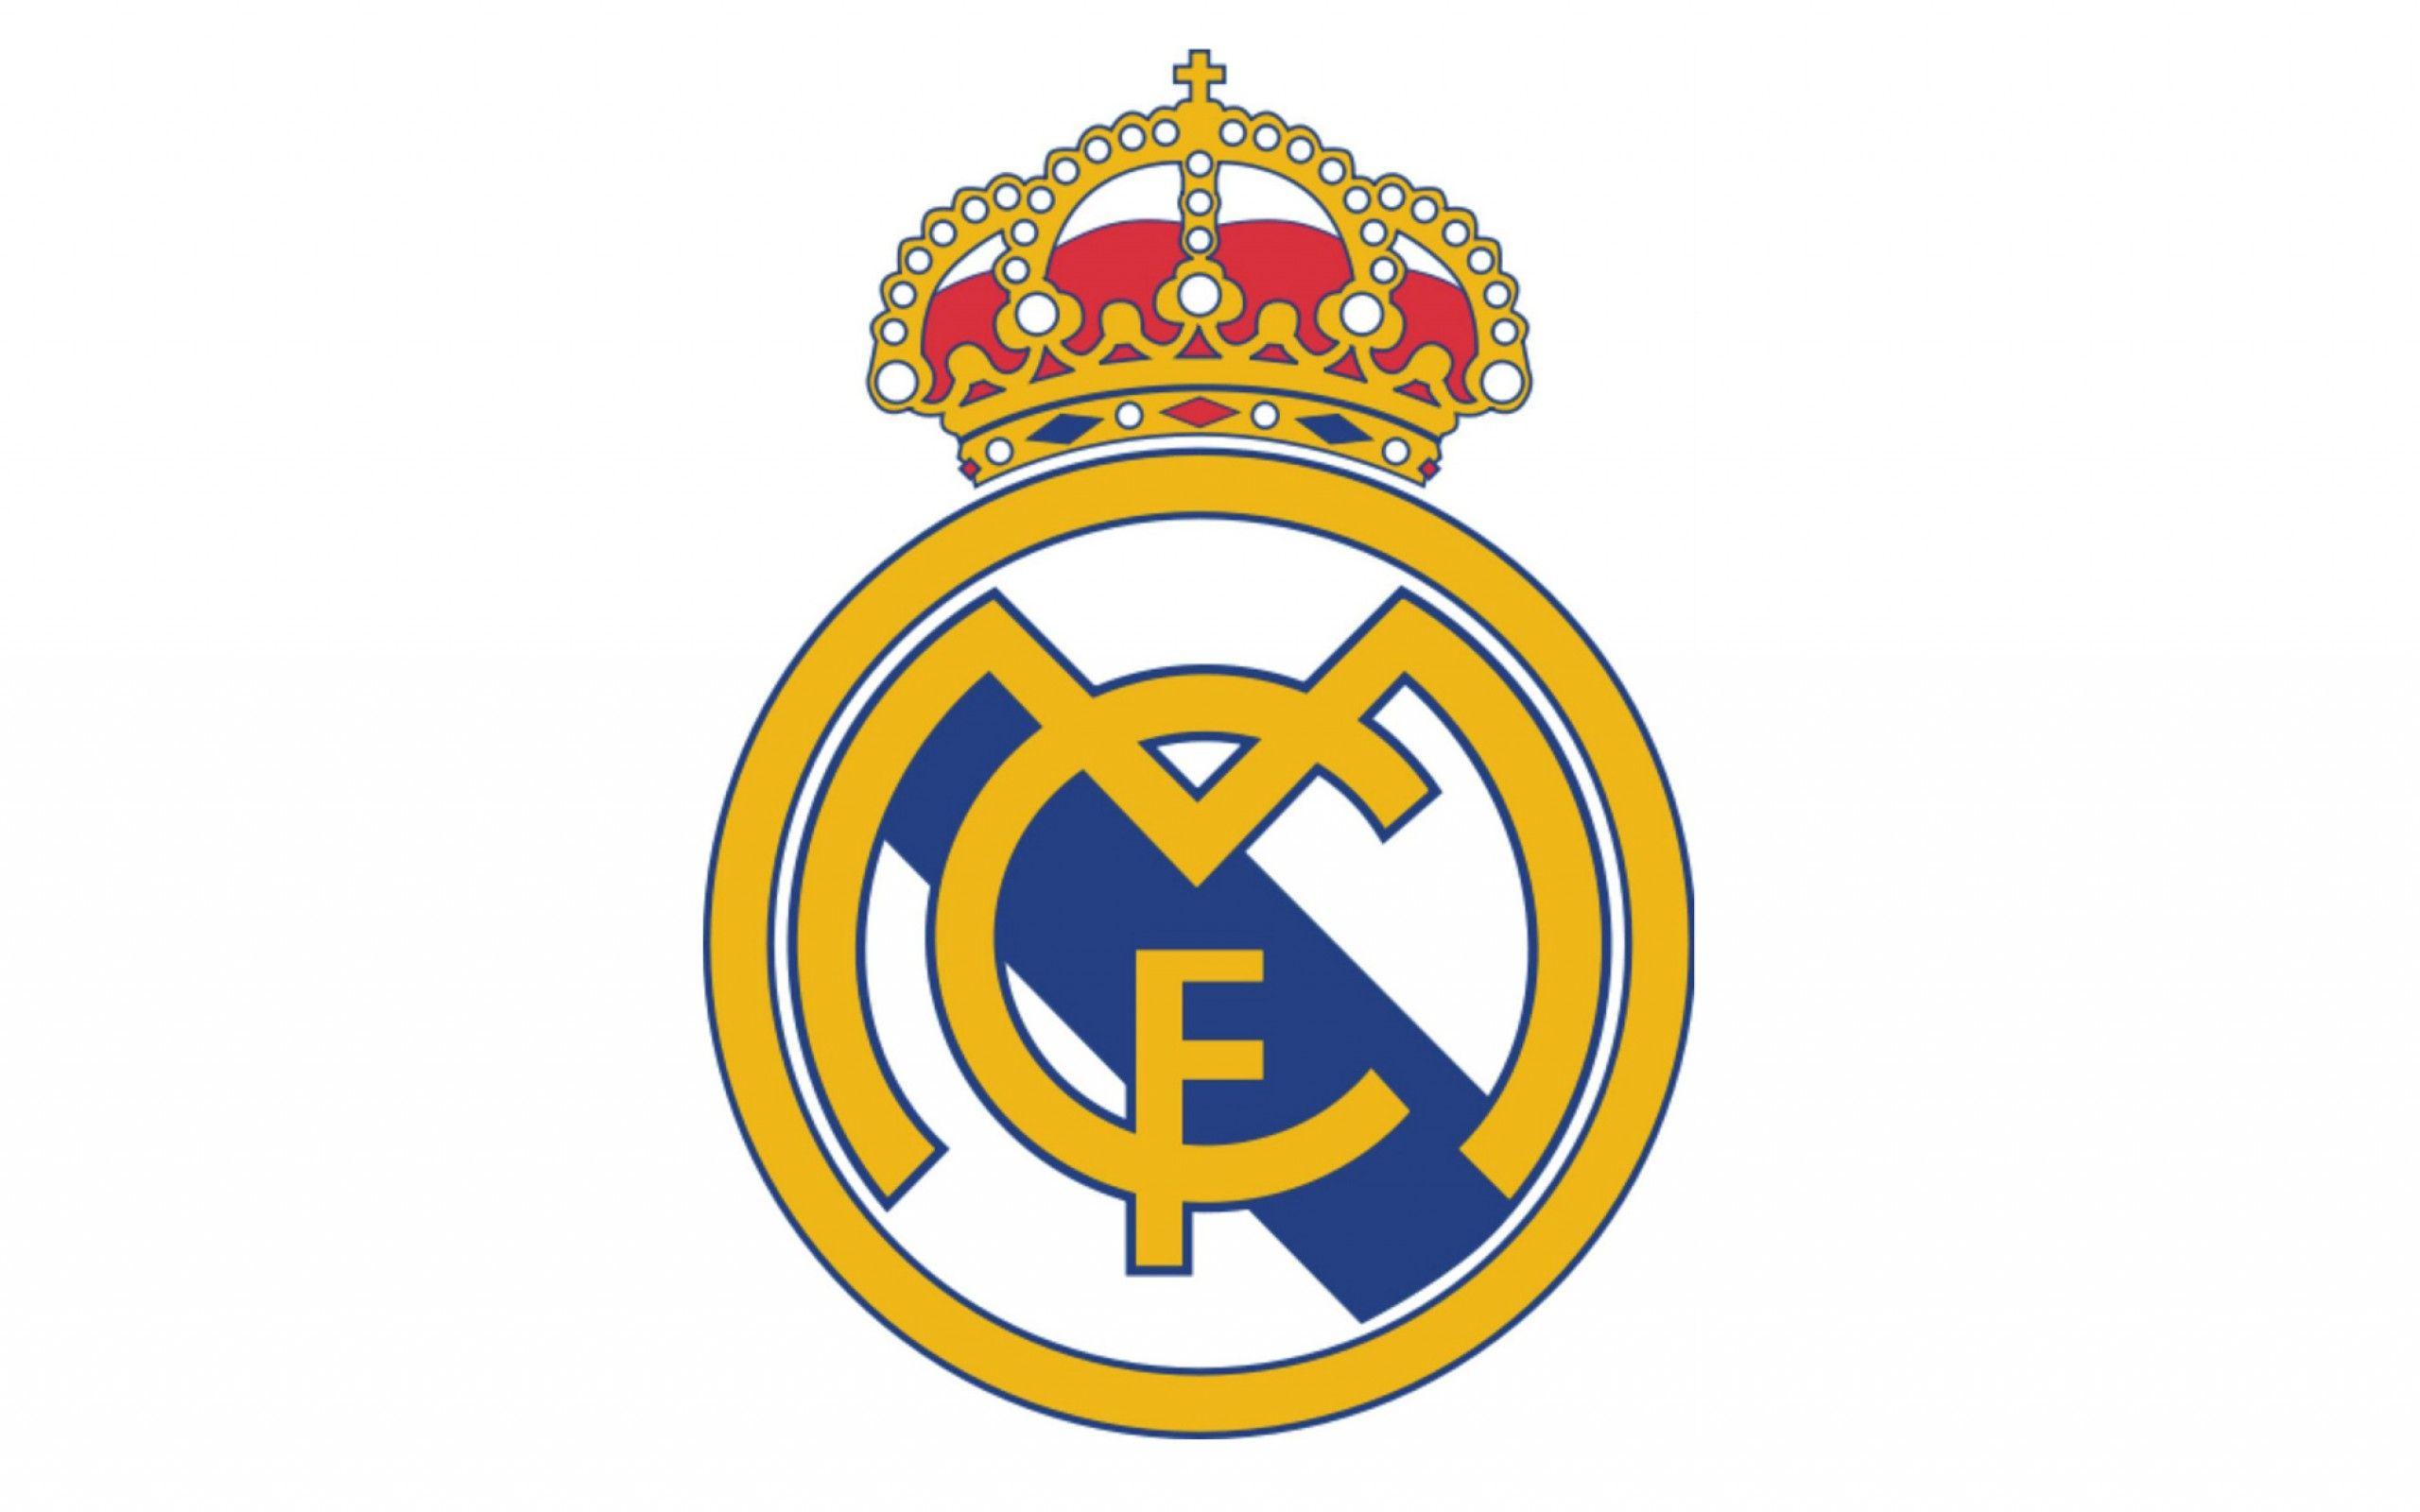 New Logo Real Madrid Wallpaper Hd 26996 Sports 8211 Siayvo Real Madrid Kit Real Madrid Wallpapers Real Madrid Logo